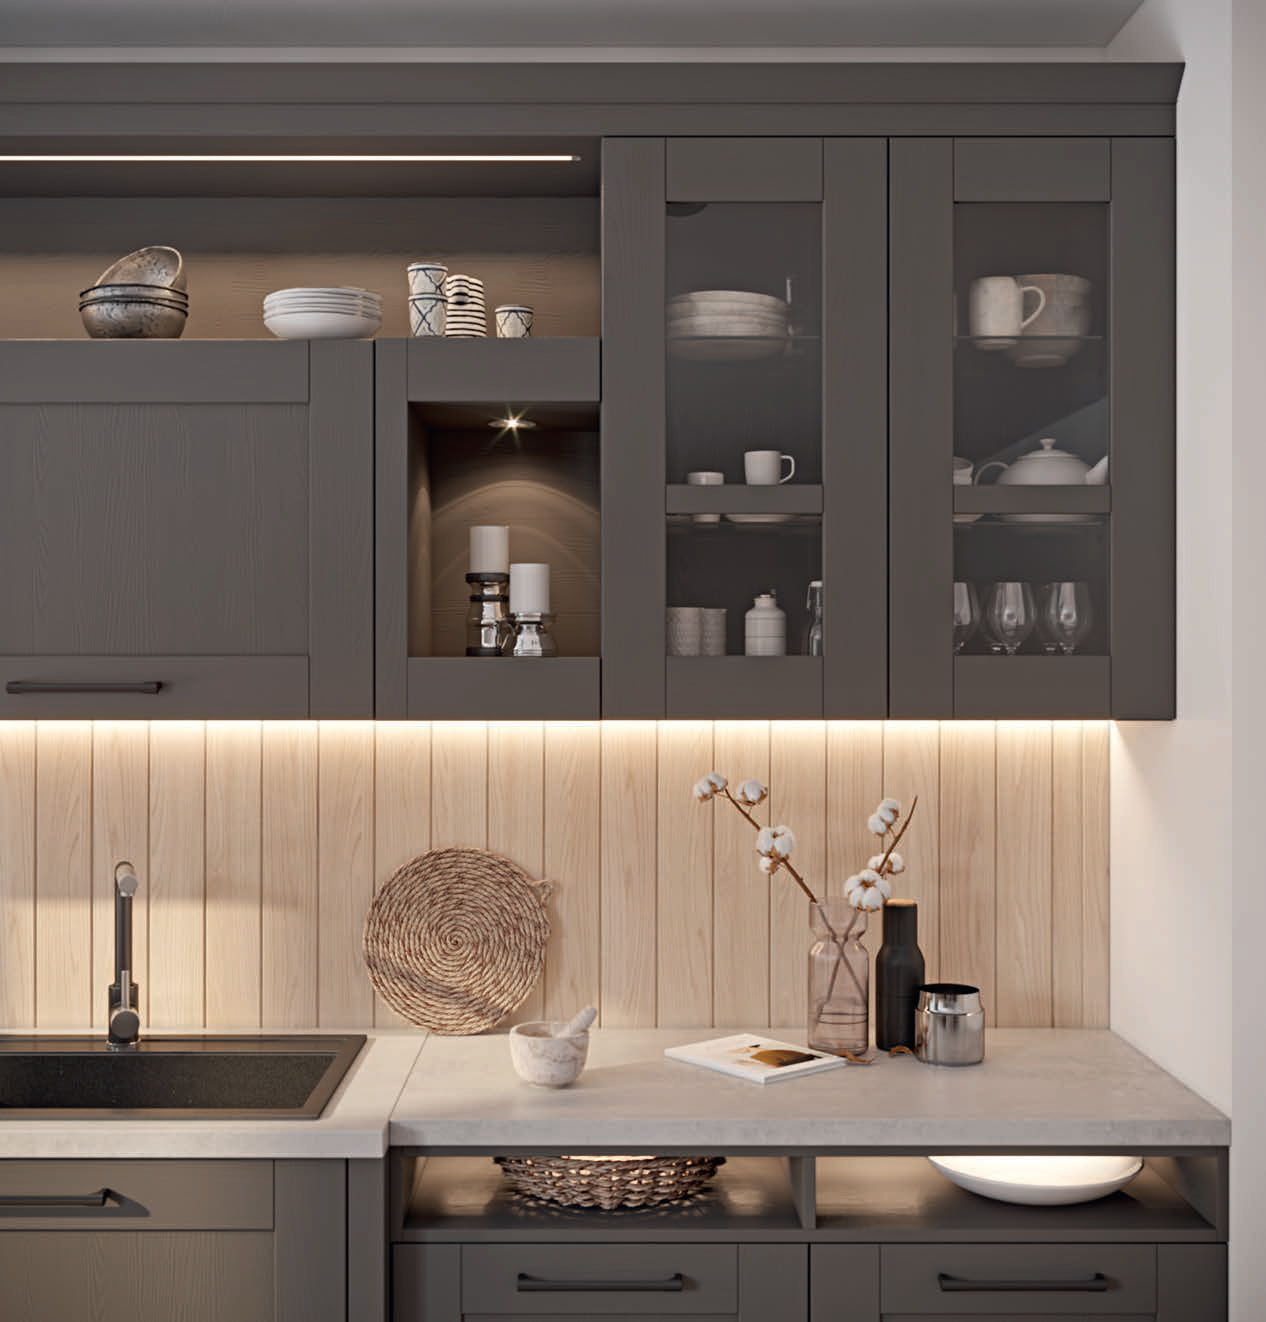 Pin By Zov Kuchnie On Kuchnie Klasyczne Decor Home Decor Home